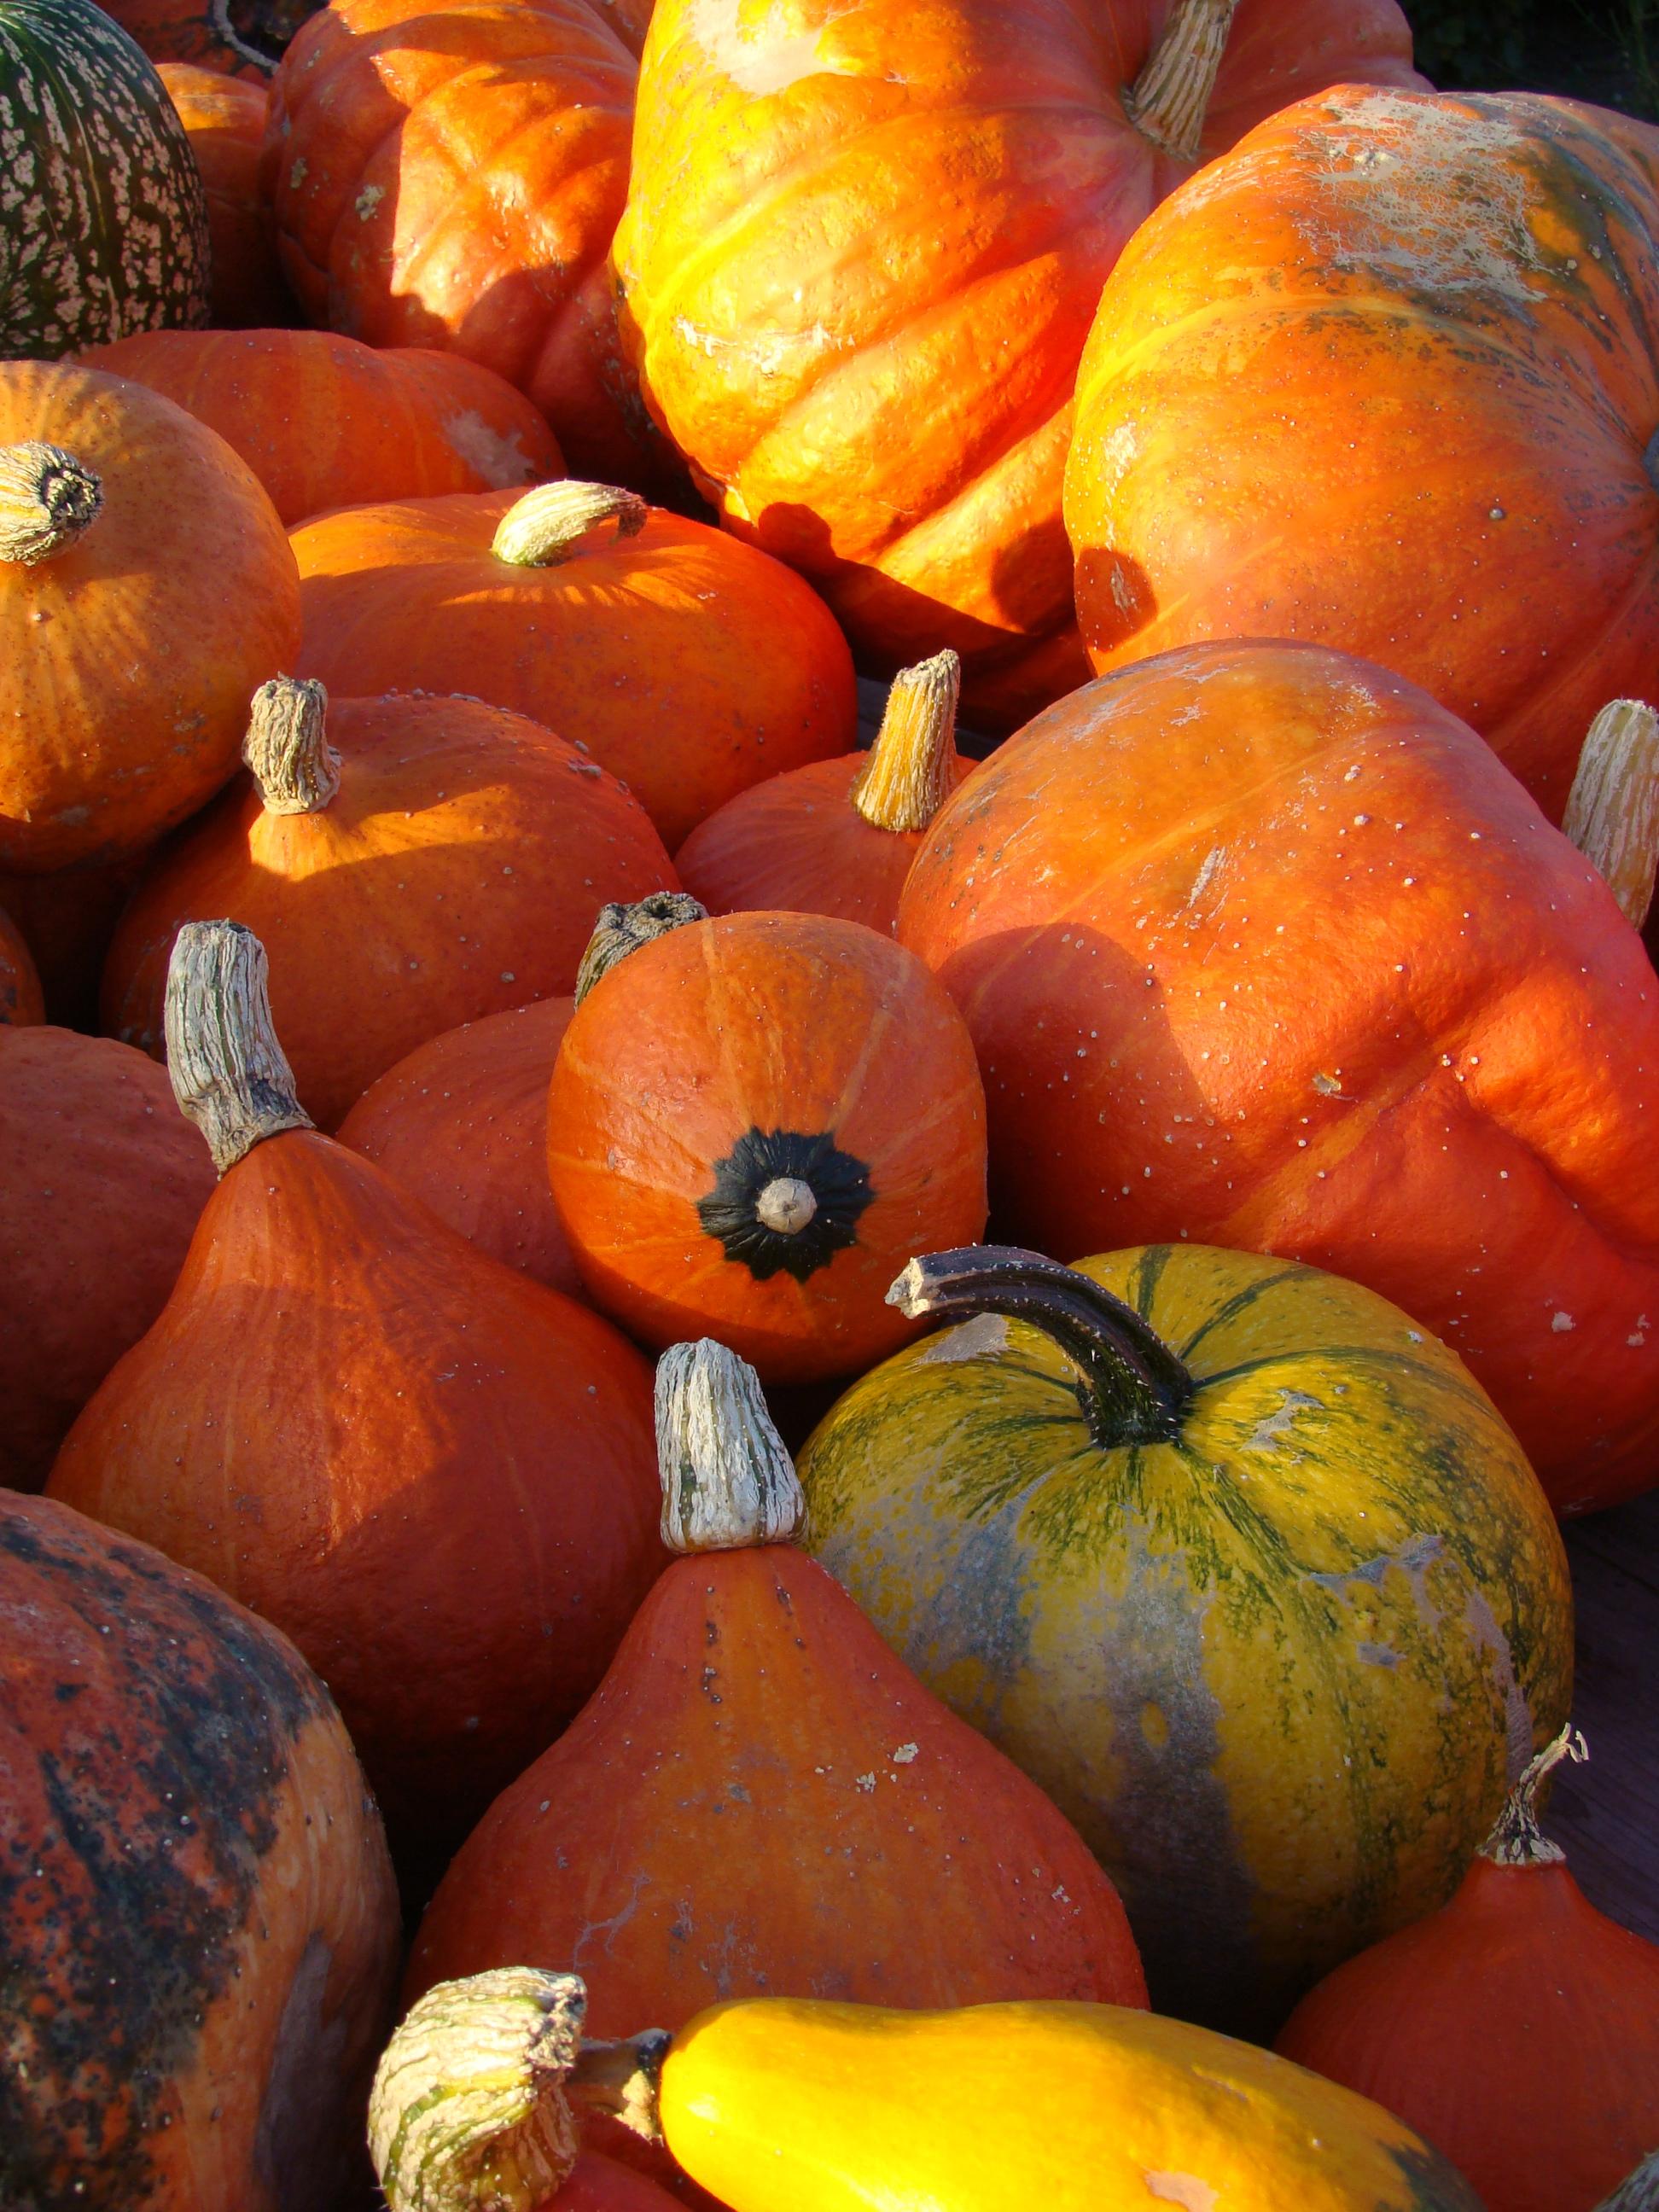 txpinky pumpkins orange fruit bright Halloween images